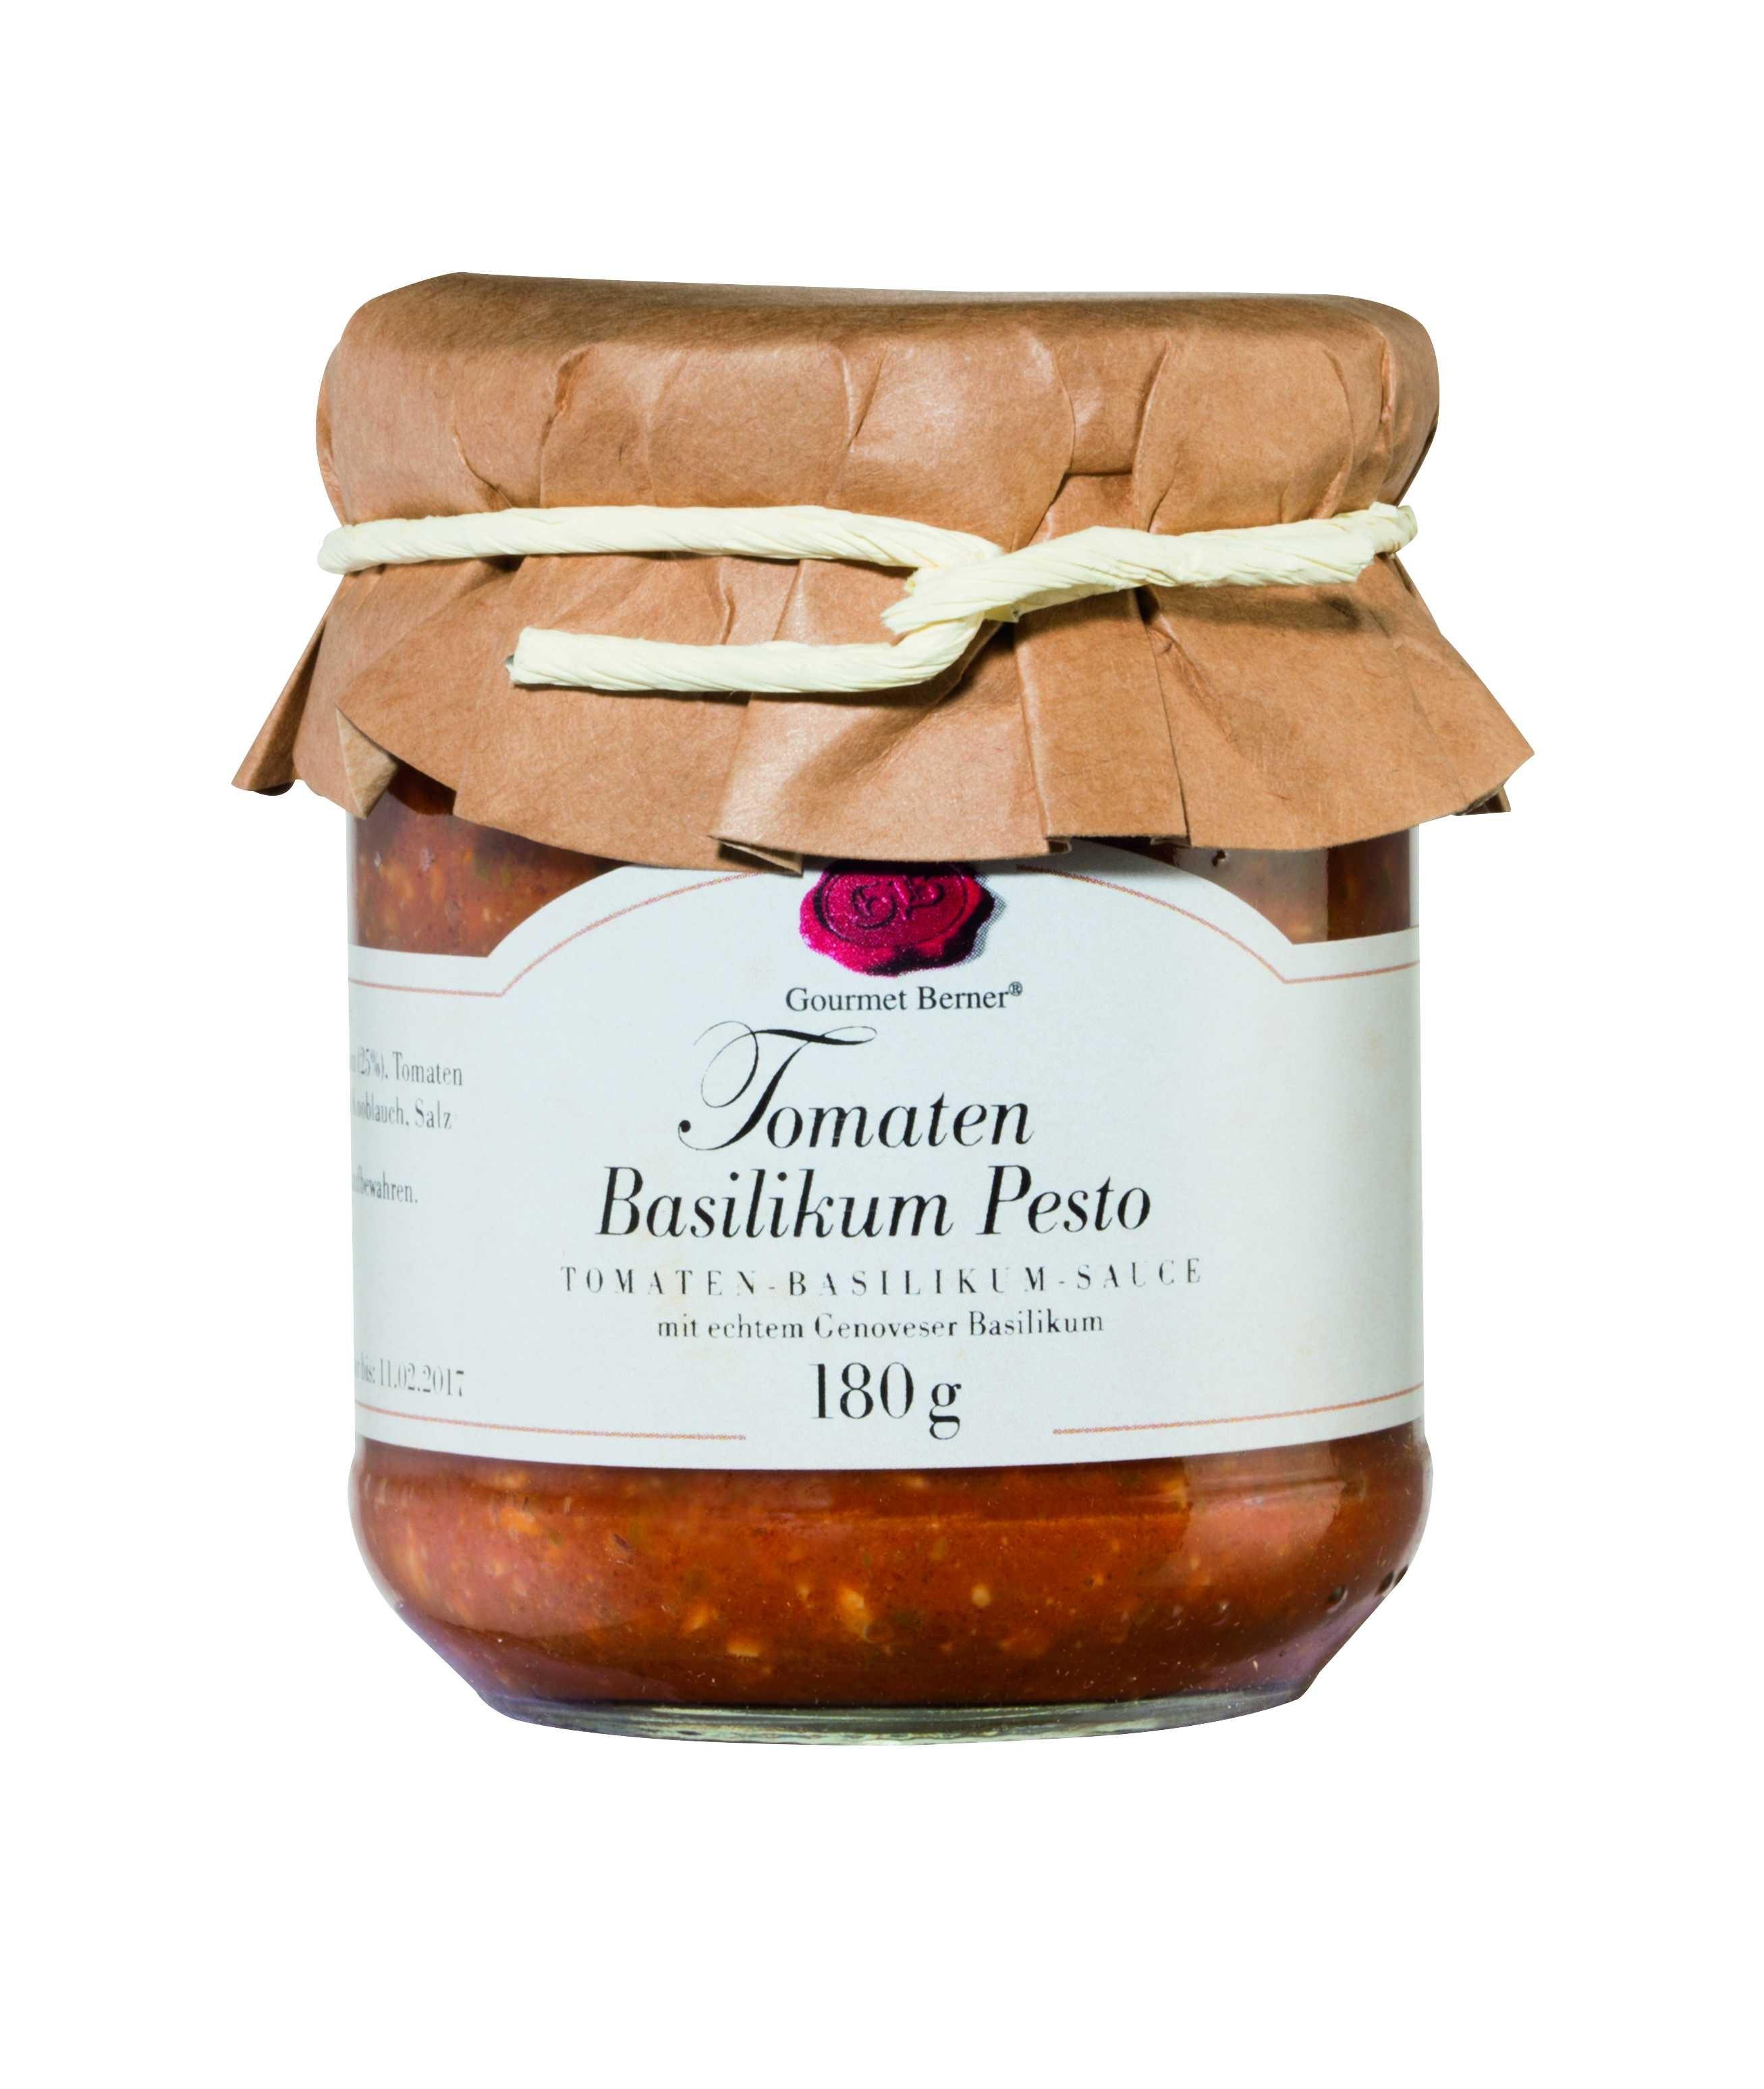 Tomaten Basilikum Pesto - Pesto al Pomodoro im 180g Glas